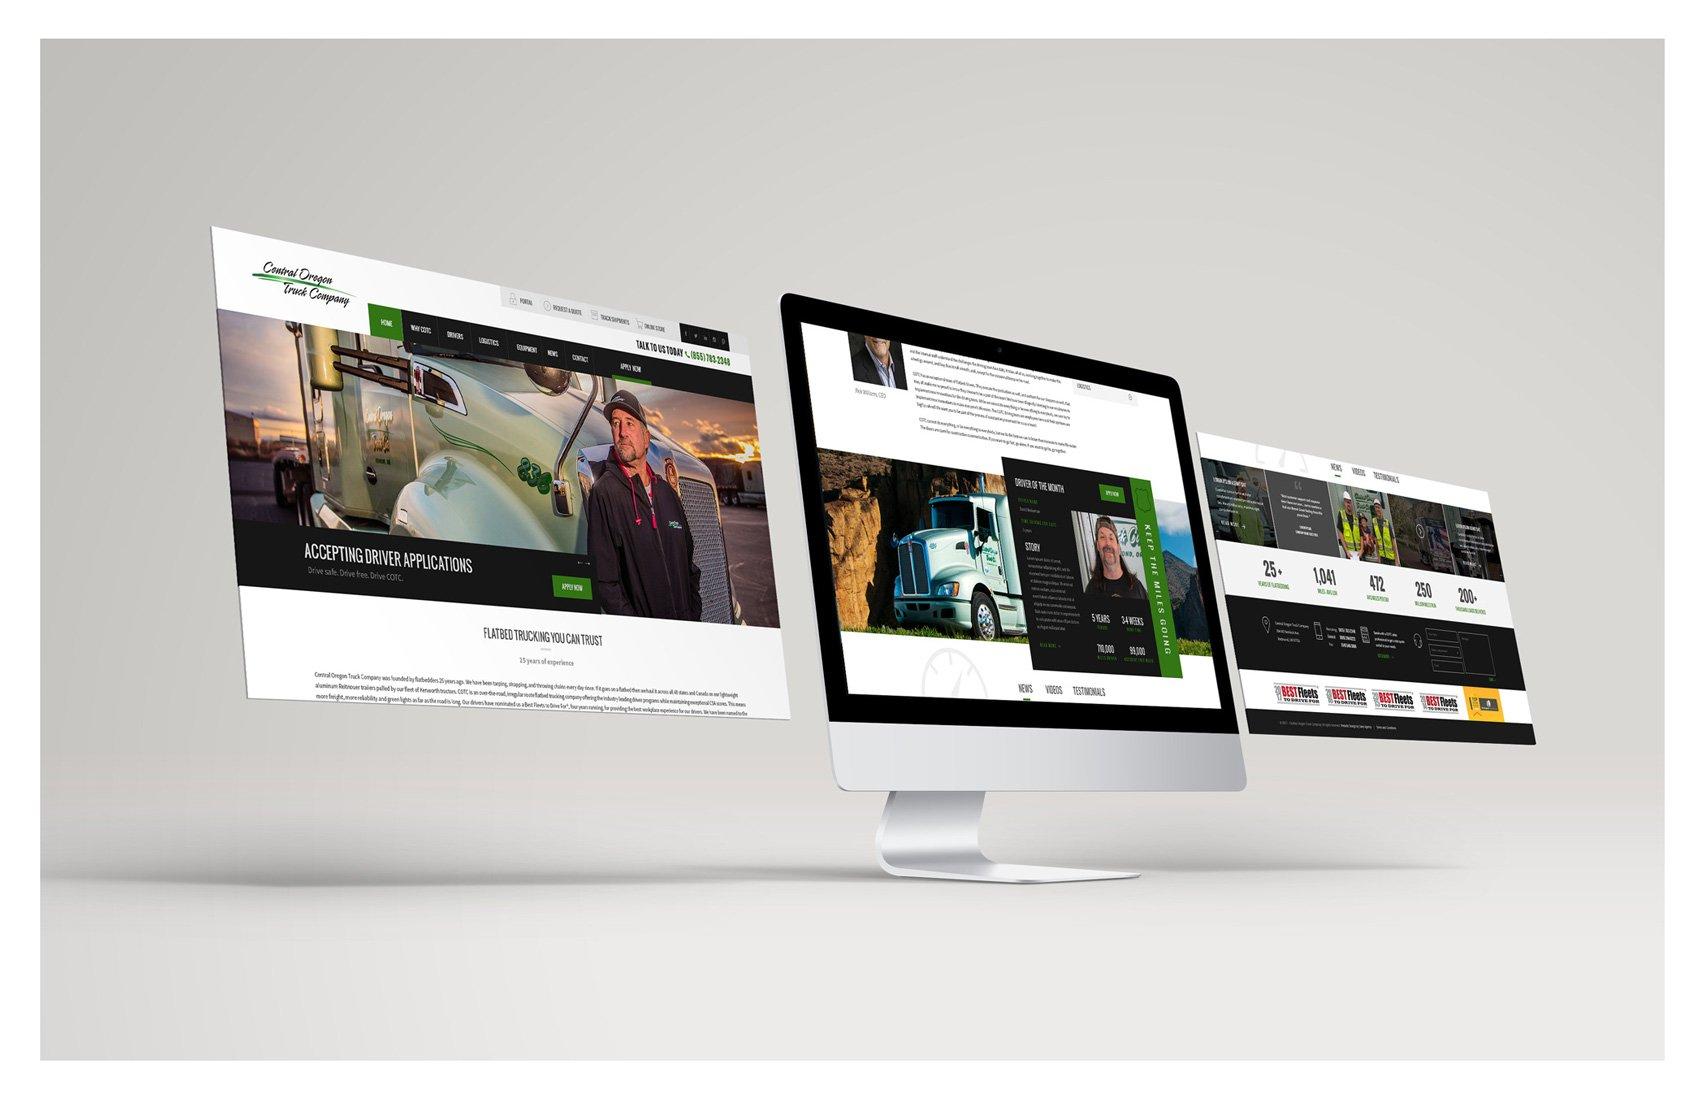 COTC-case-study-savy-screens-up